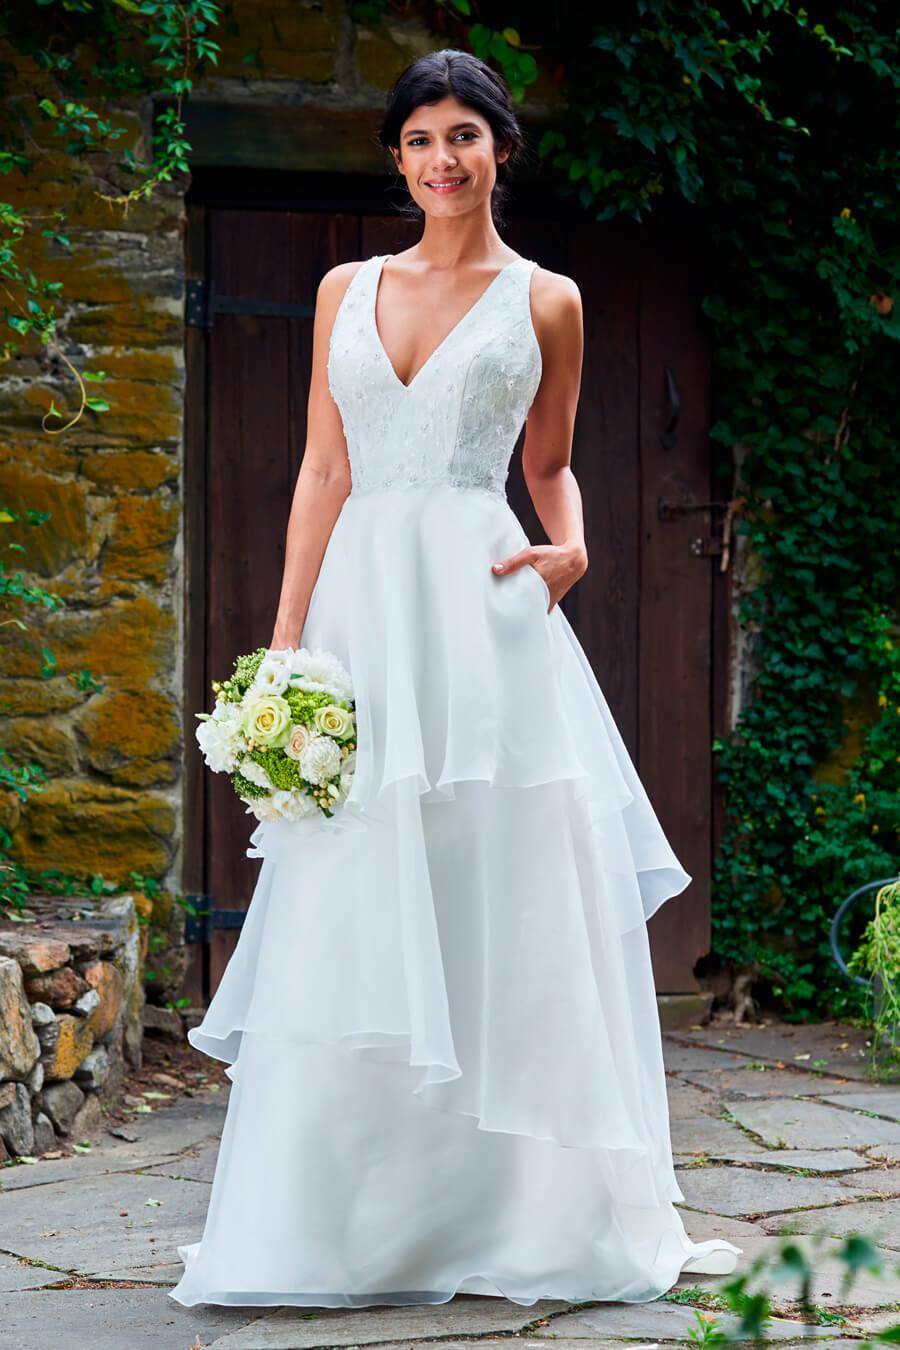 Bridesmaid Dresses Evening Gowns Flower Girl Bari Jay Jolie Clothing Dakota Long Dress Style 2092